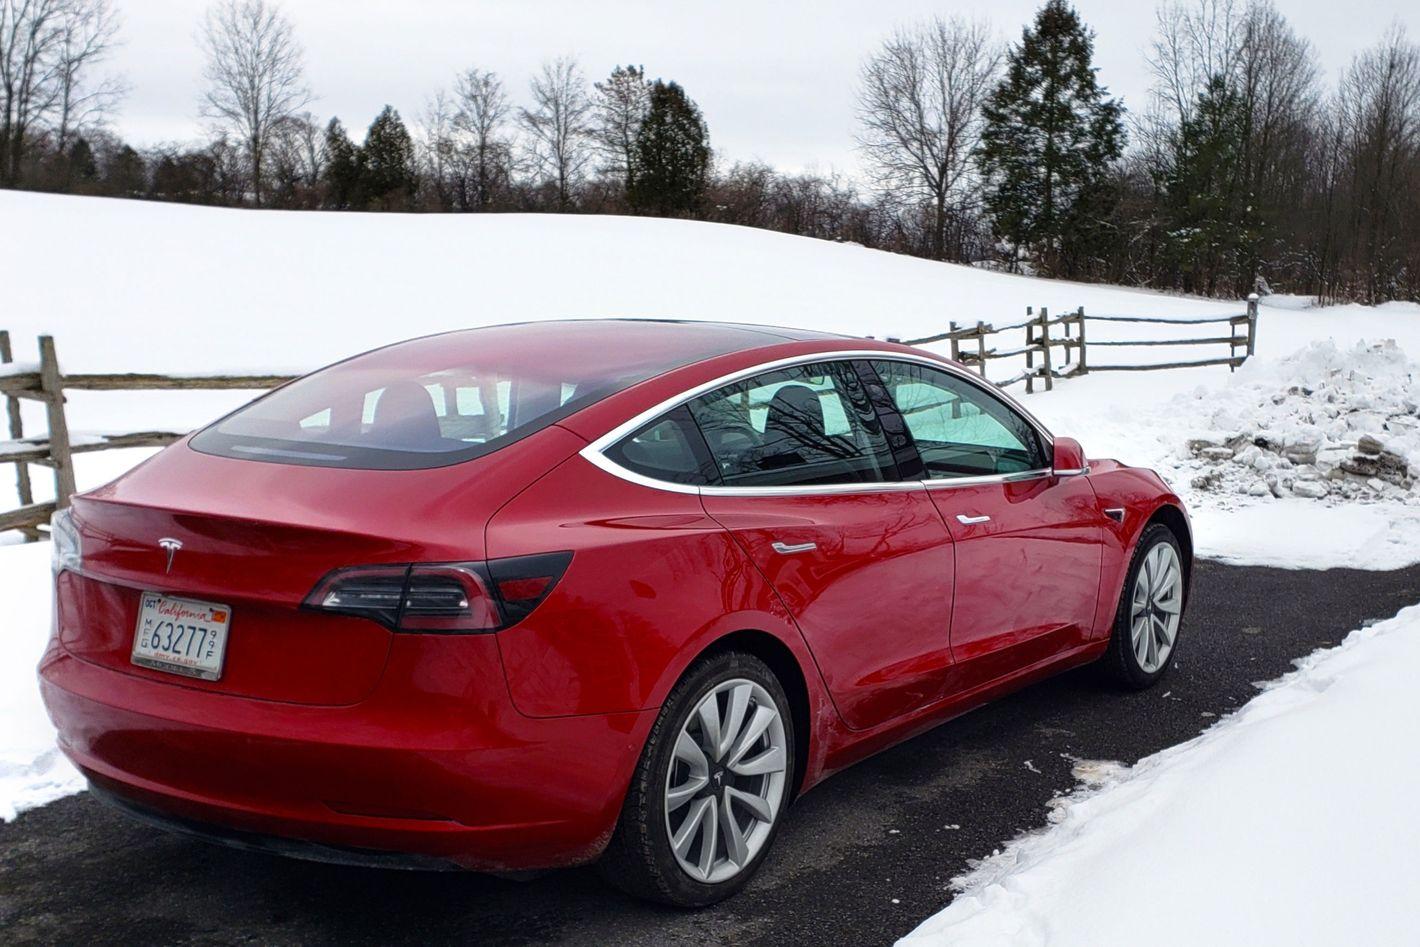 Tesla Model 3 Review: What It's Like to Drive Tesla's New EV